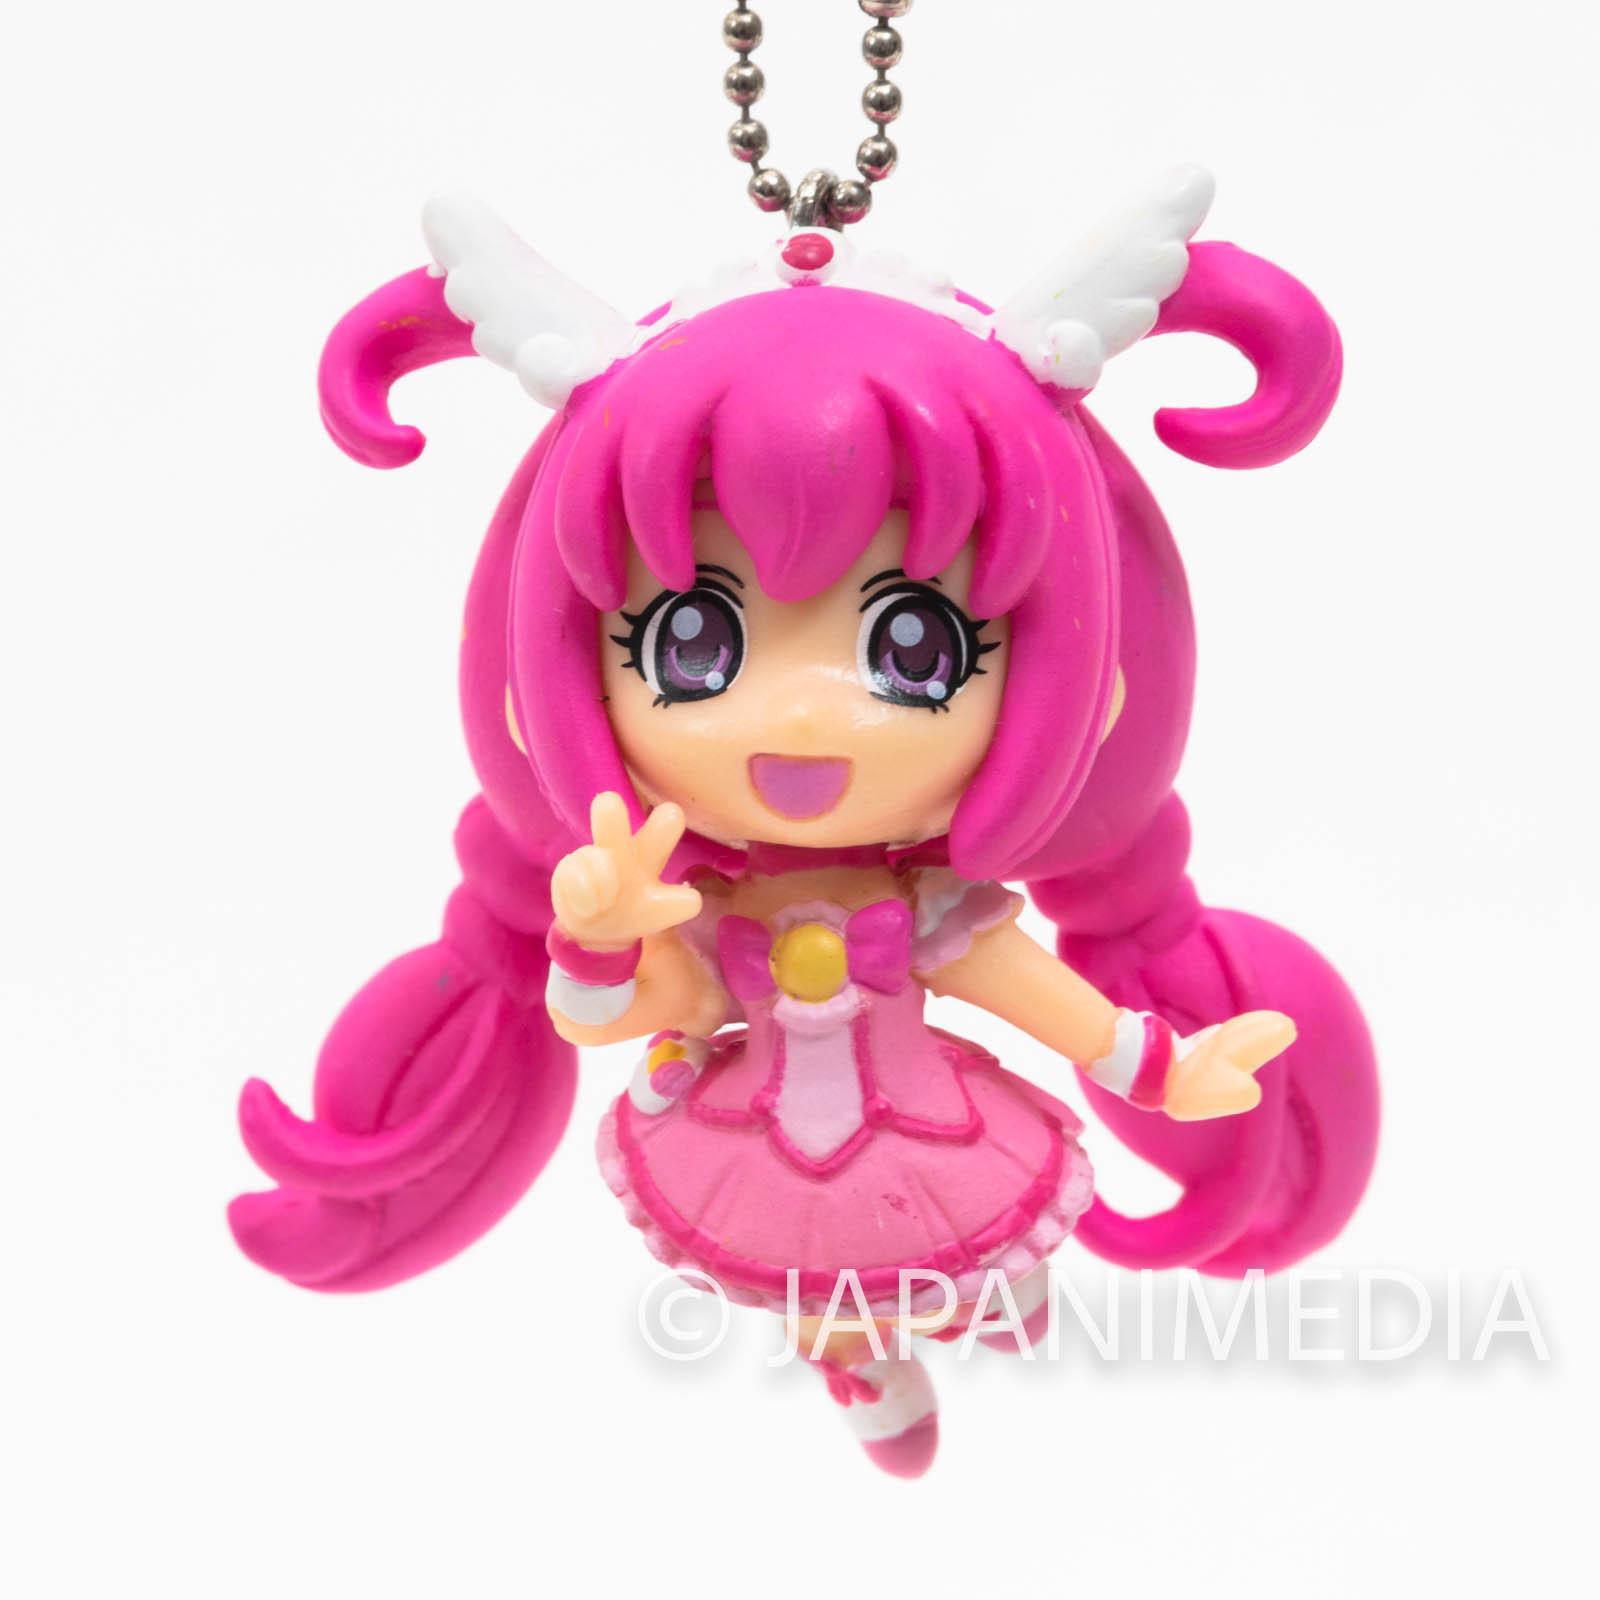 Smile PreCure! Cure Happy PreCure Mascot Figure Ball Keychain JAPAN ANIME